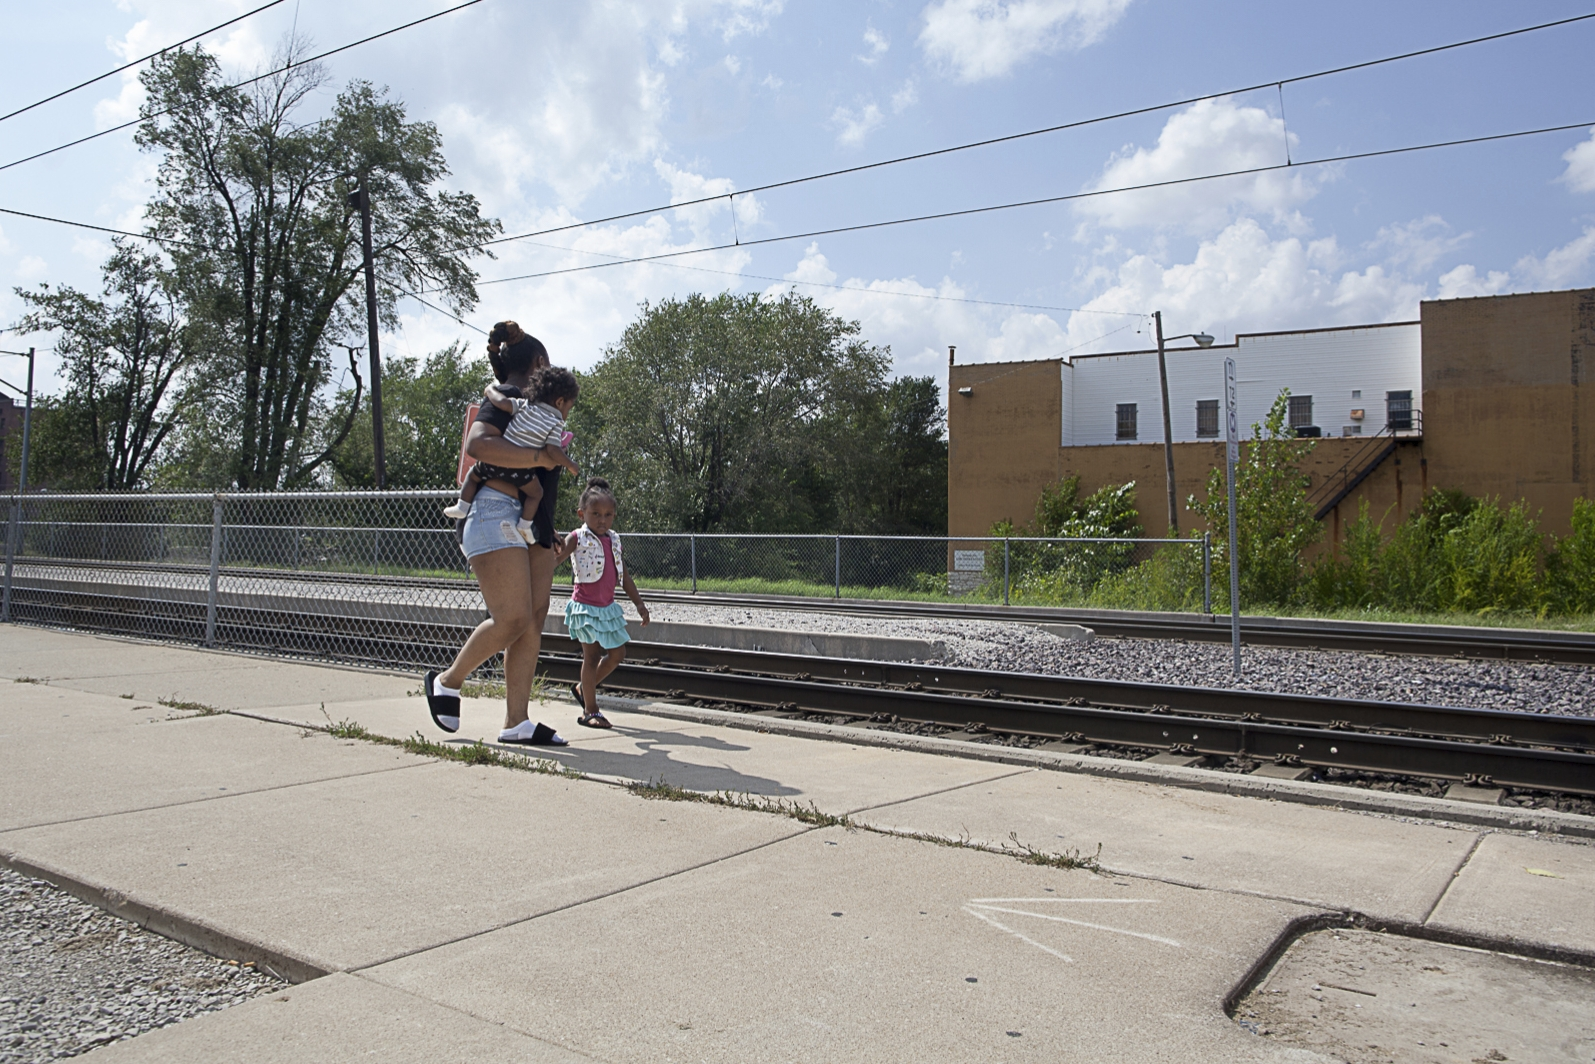 Family Leaving Metrolink Train Station, East St. Louis, IL